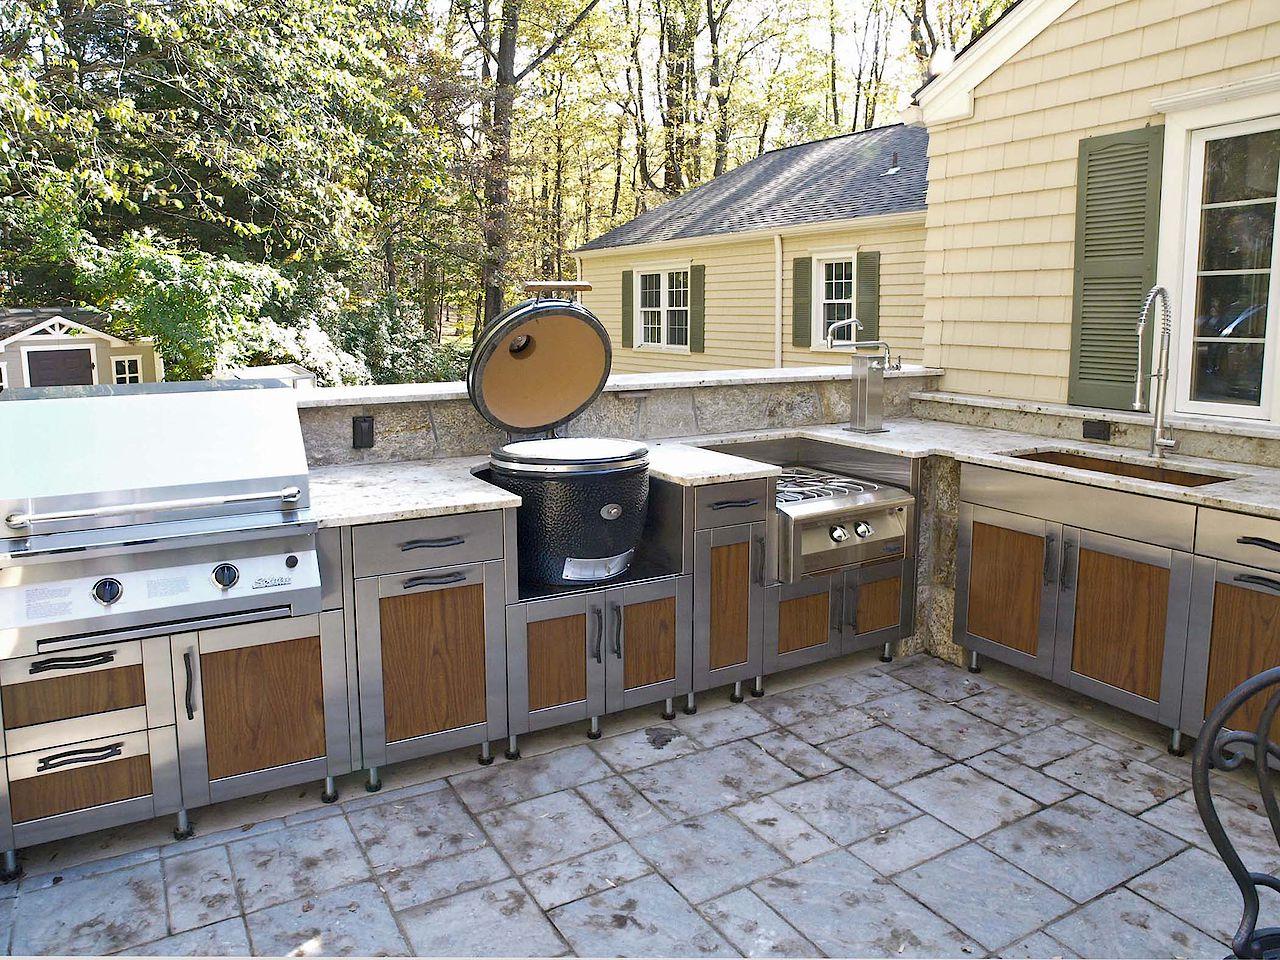 woodbridge_s_kitchen.jpg